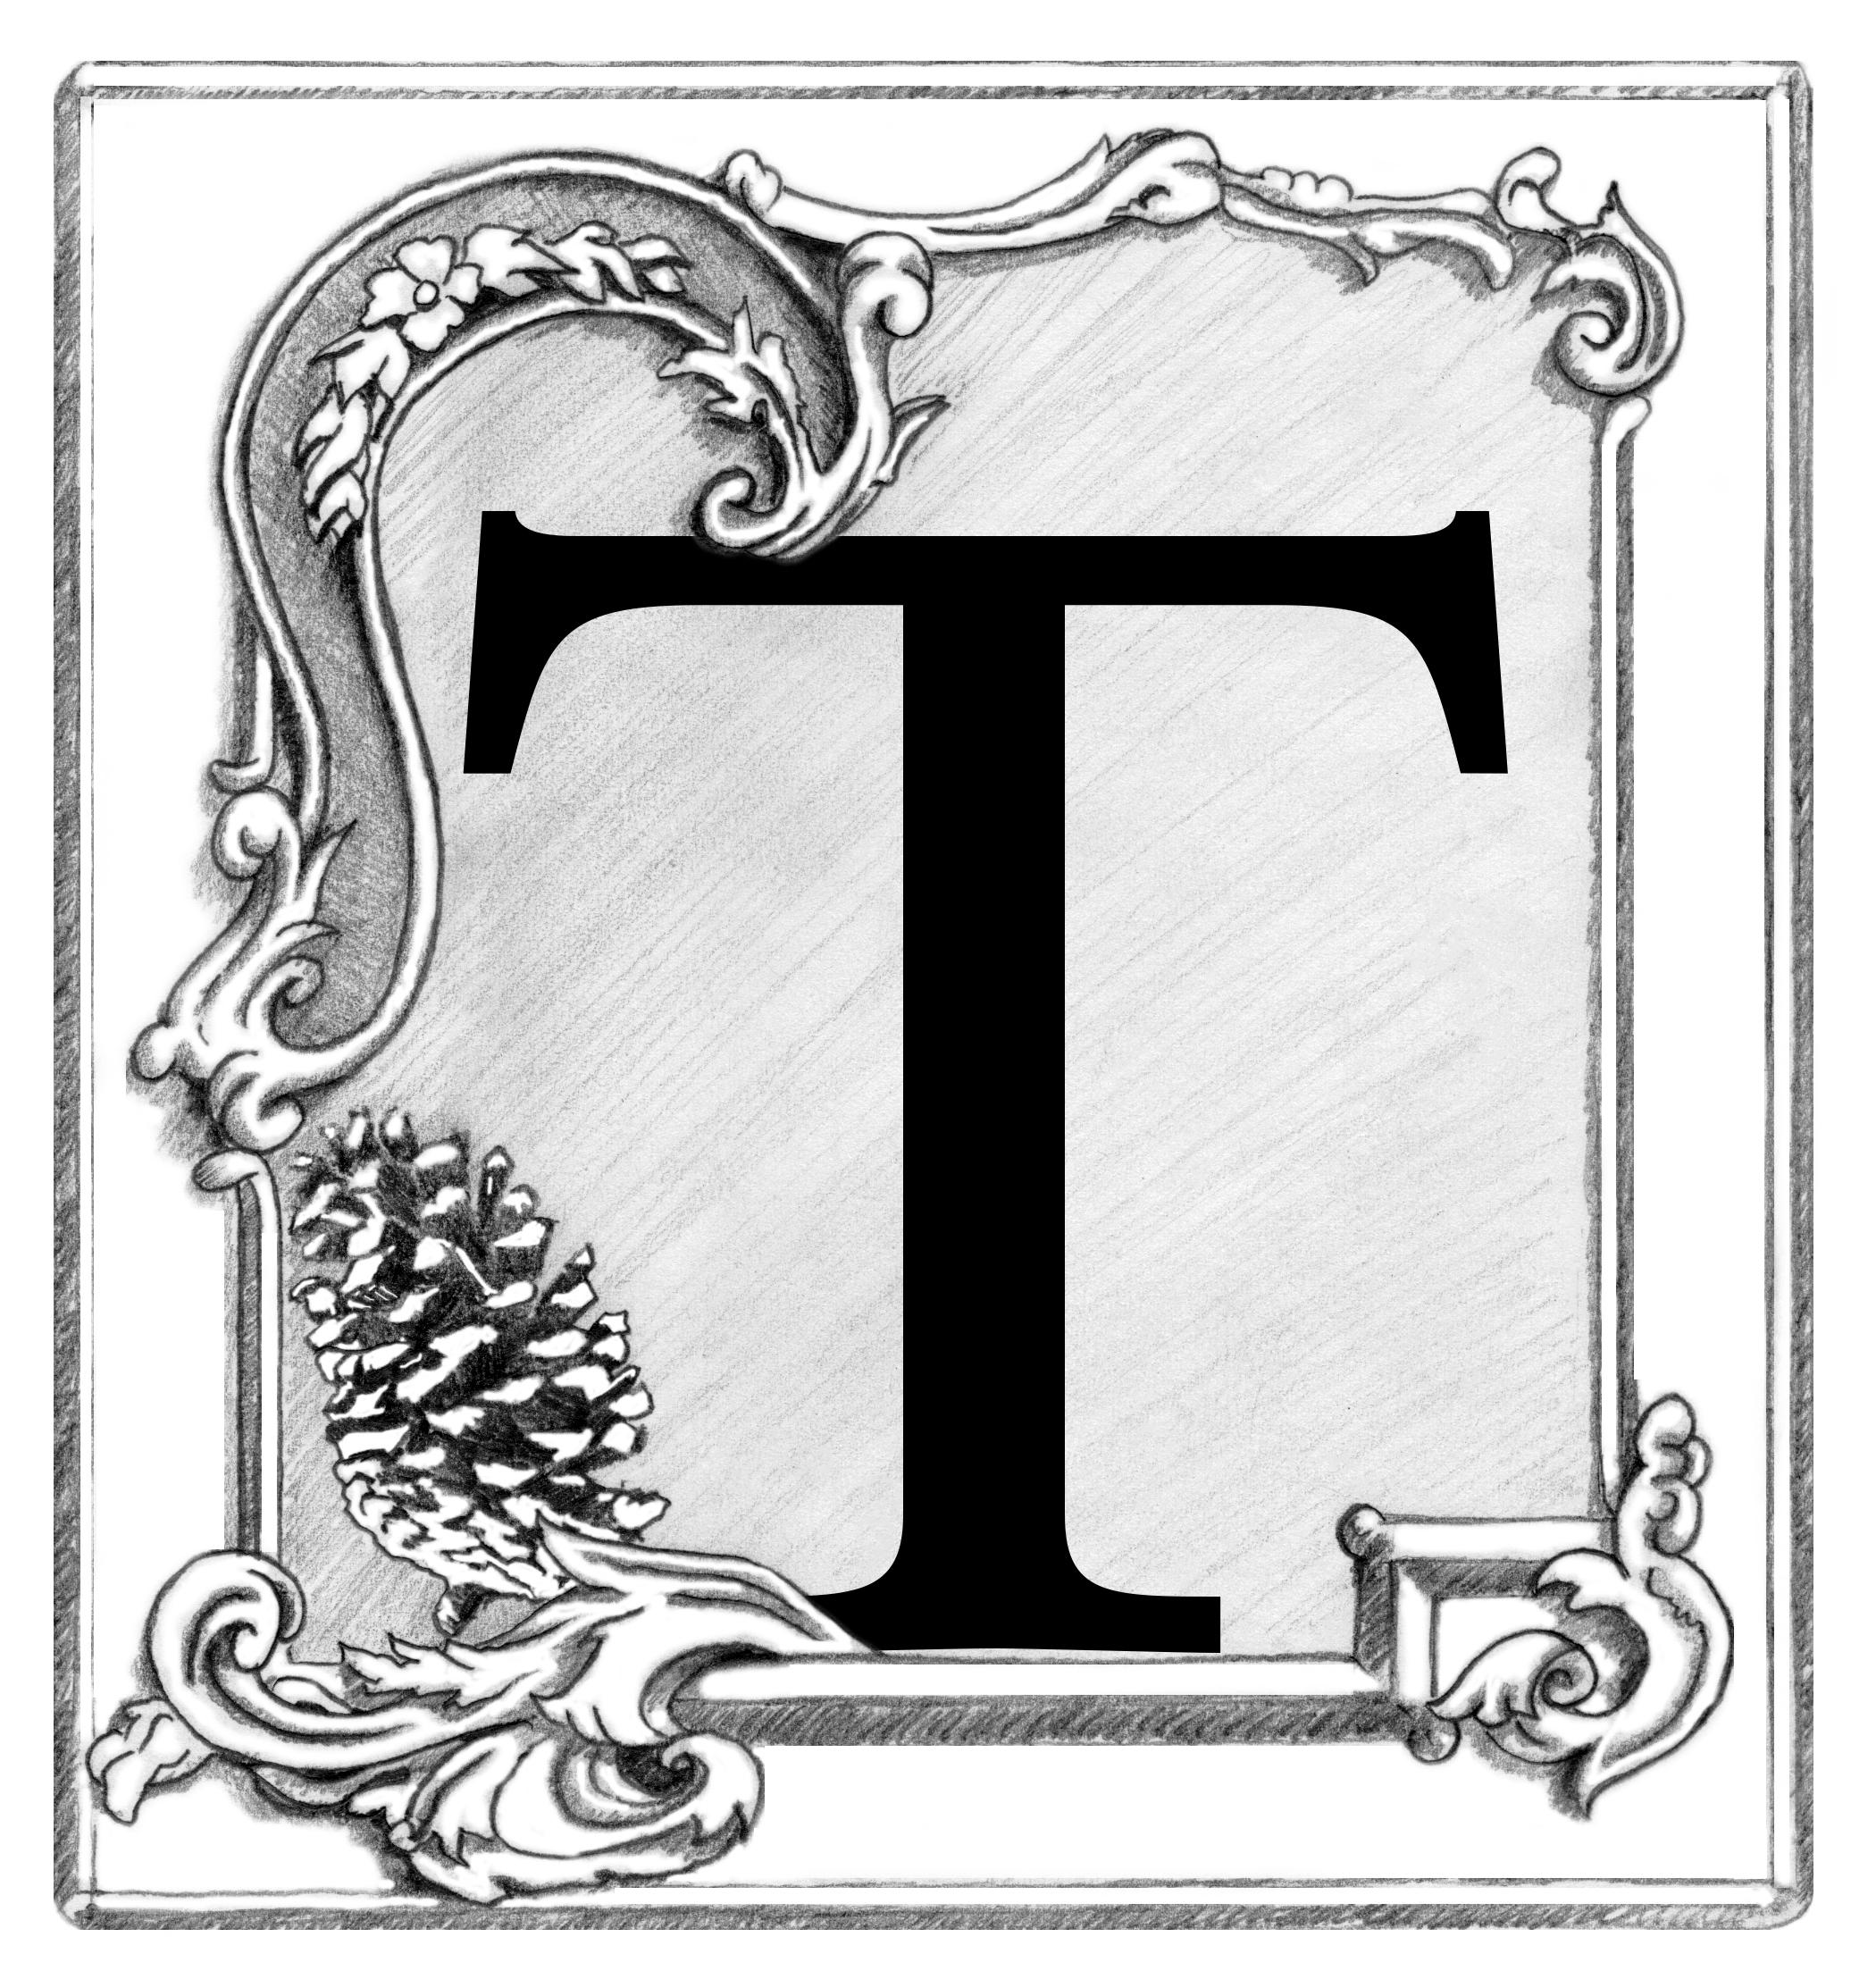 Custom drop cap letter in the publication.